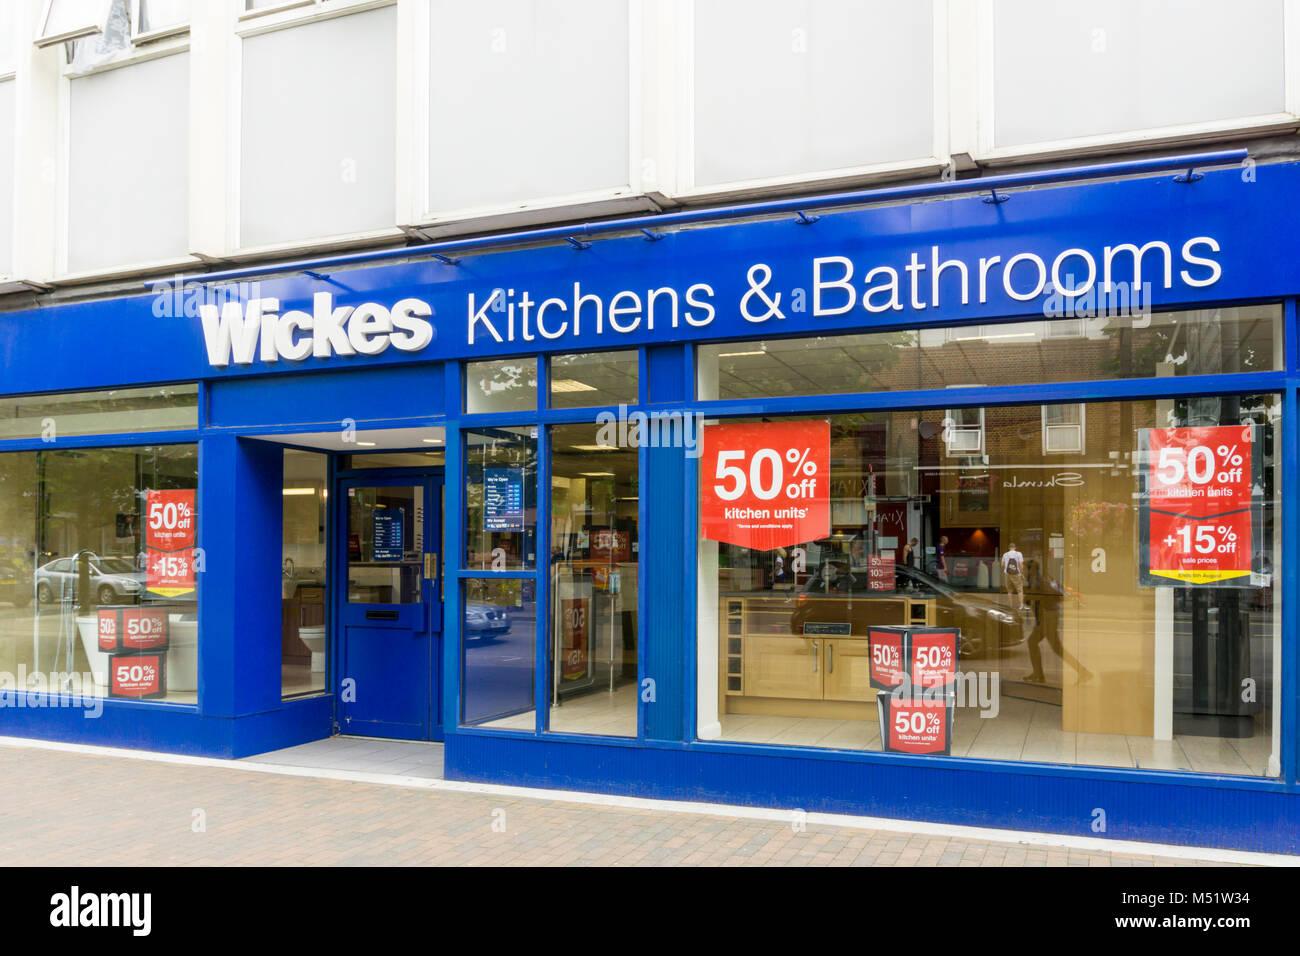 Wickes Cucine E Stanze Da Bagno Shop In Orpington High Street Foto